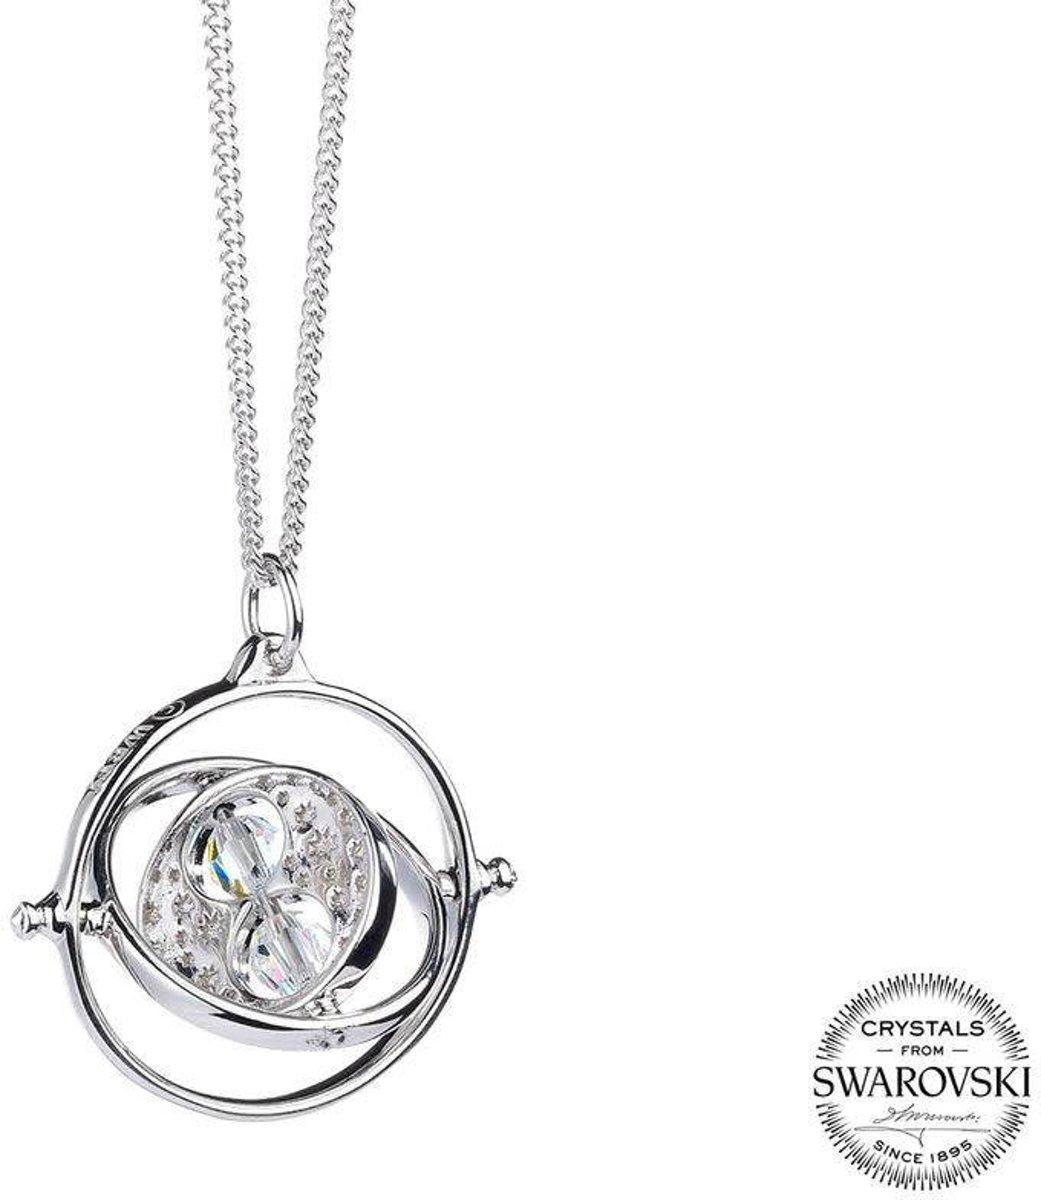 Time Turner Necklace with Swarovski crystals